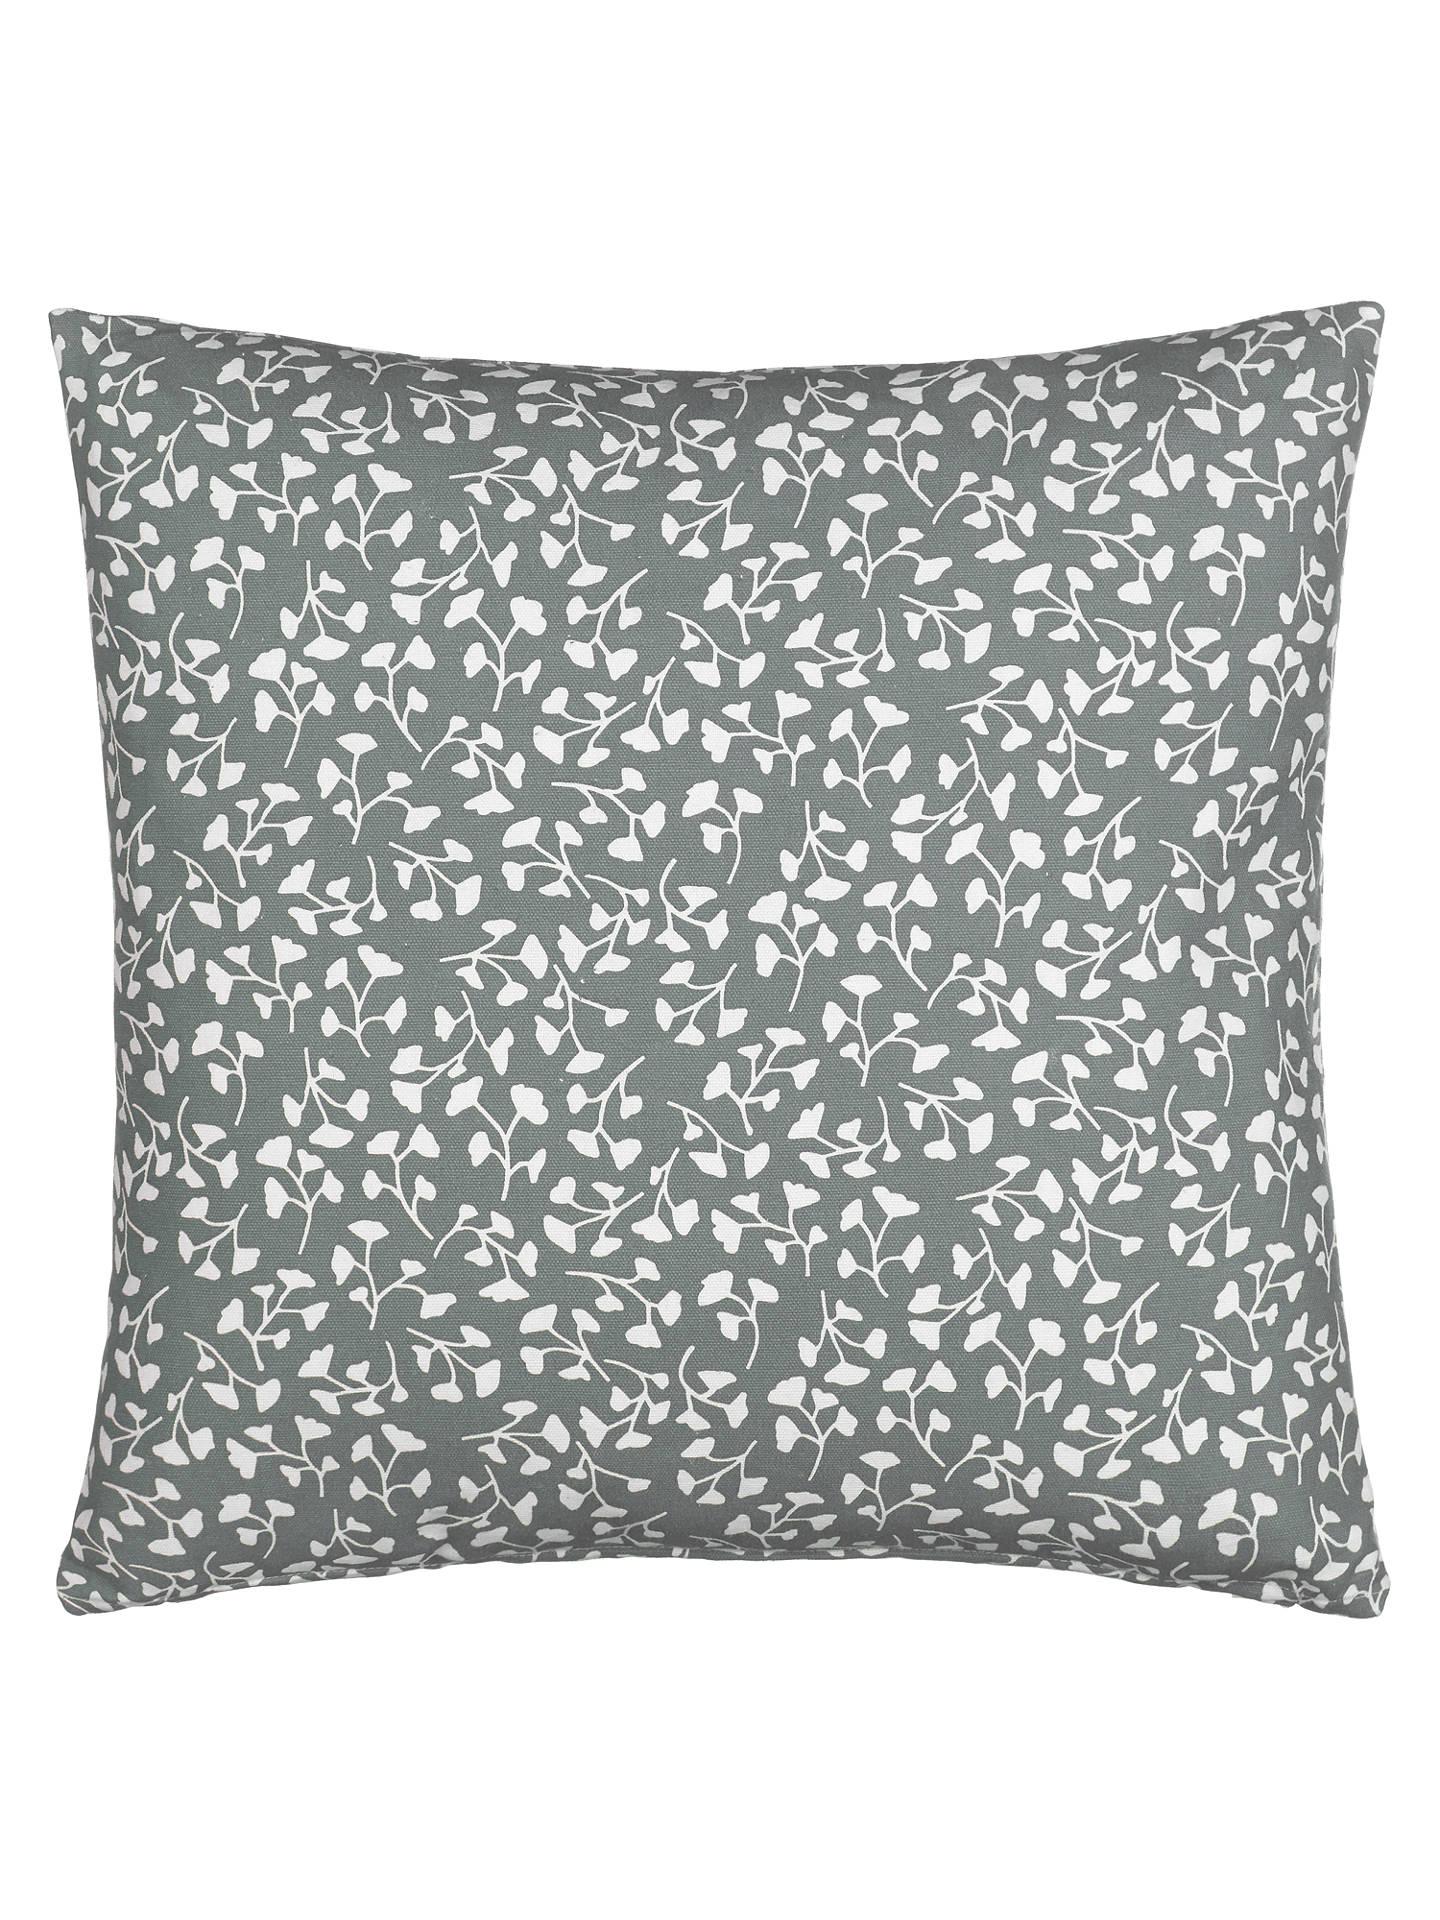 john lewis partners arley cushion at john lewis partners. Black Bedroom Furniture Sets. Home Design Ideas